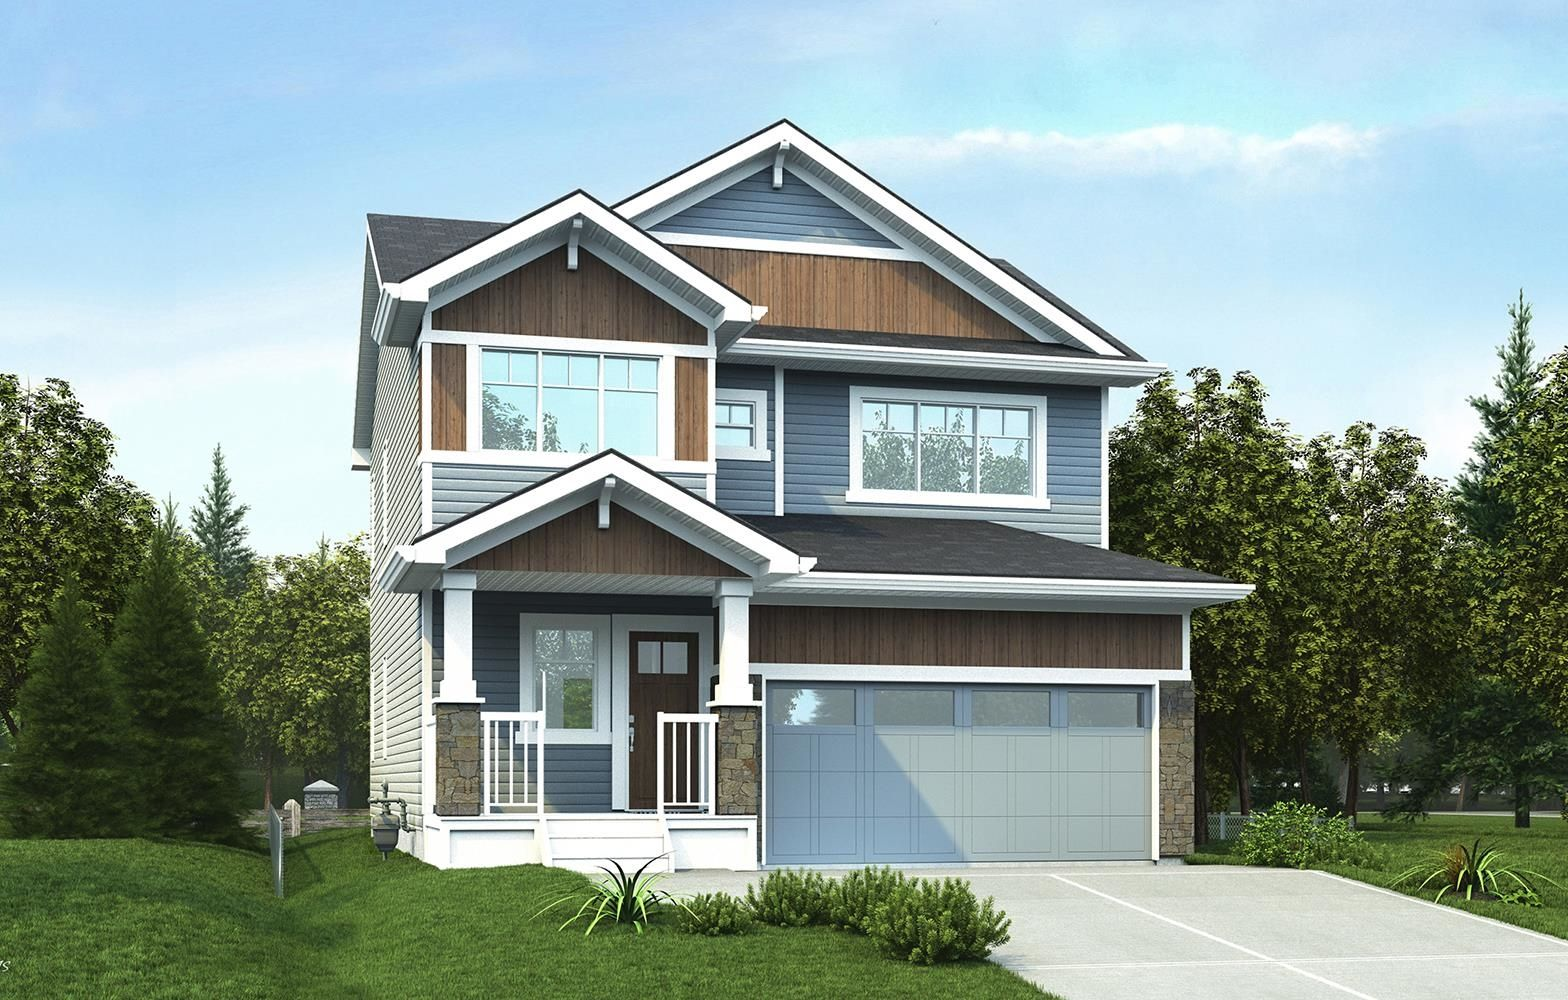 Main Photo: 10 AUTUMNWOOD Crescent: Spruce Grove House for sale : MLS®# E4263704